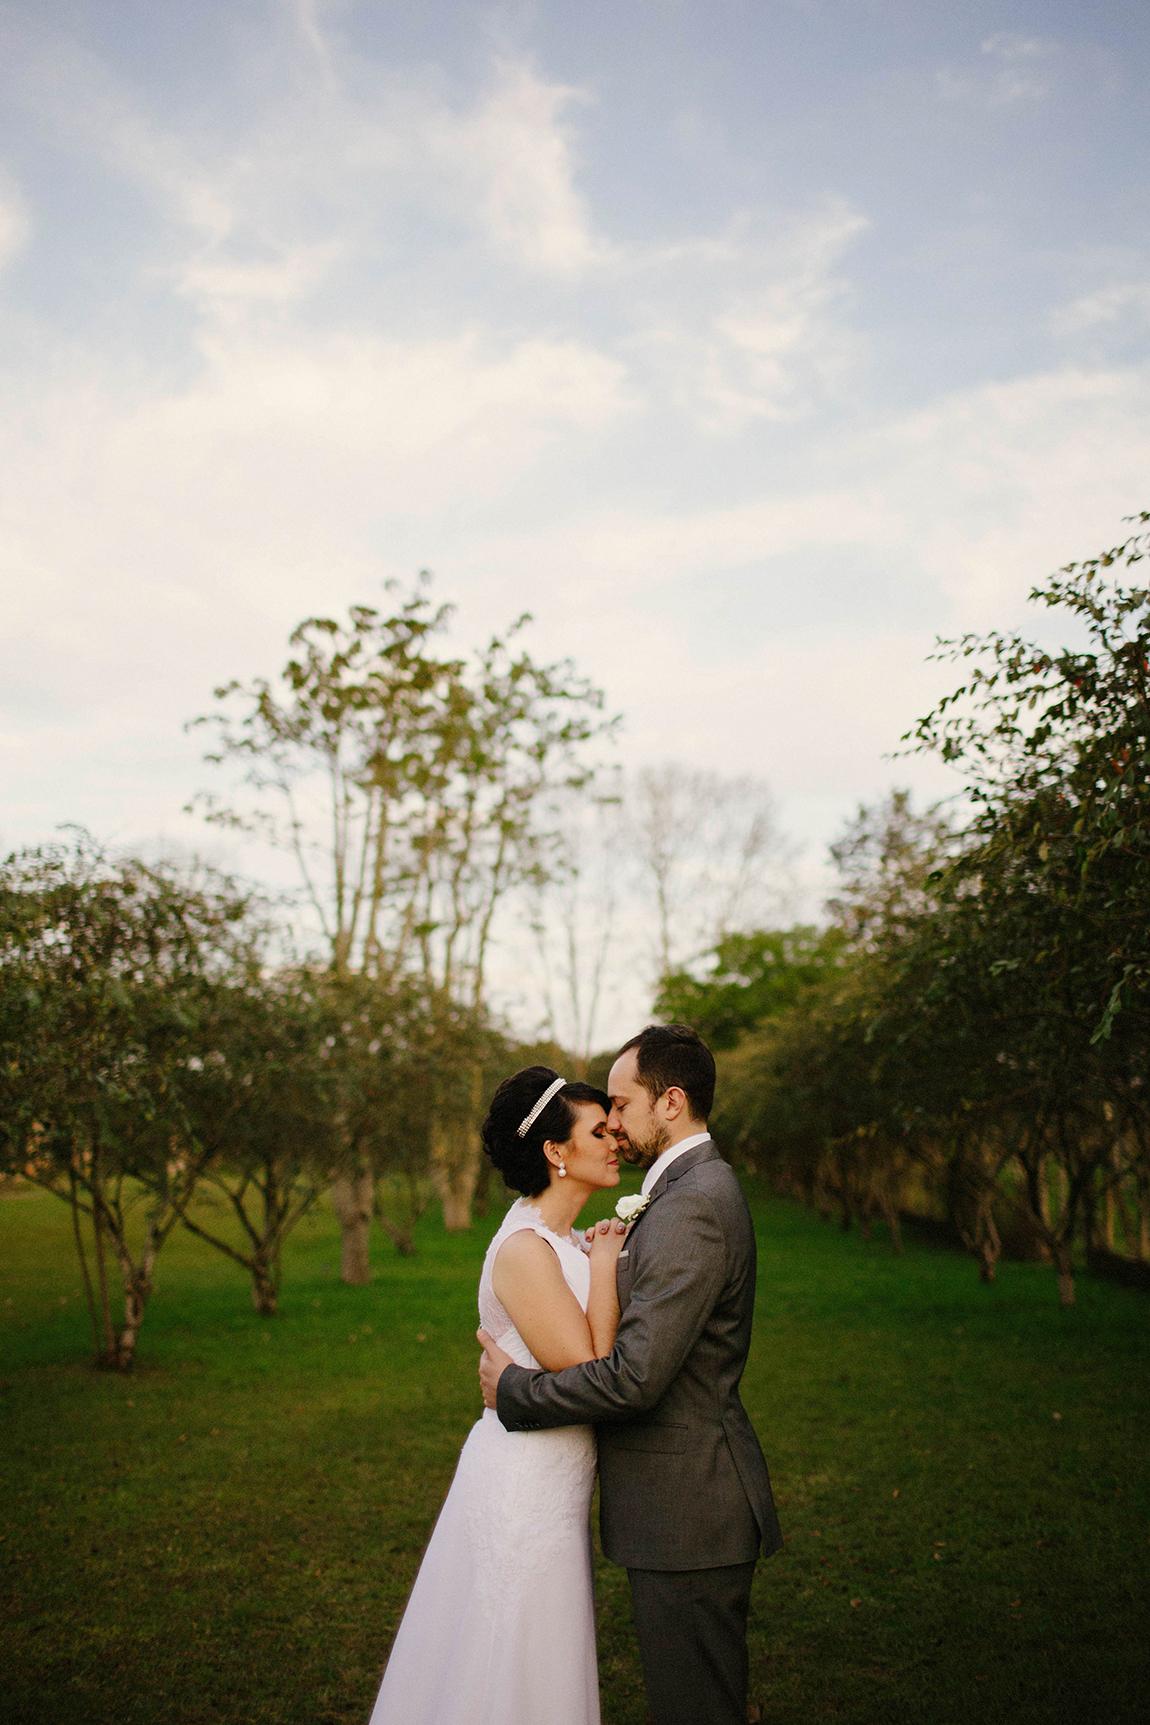 mariana-alves-fotografia-casamento-curitiba-willian-tais (248)